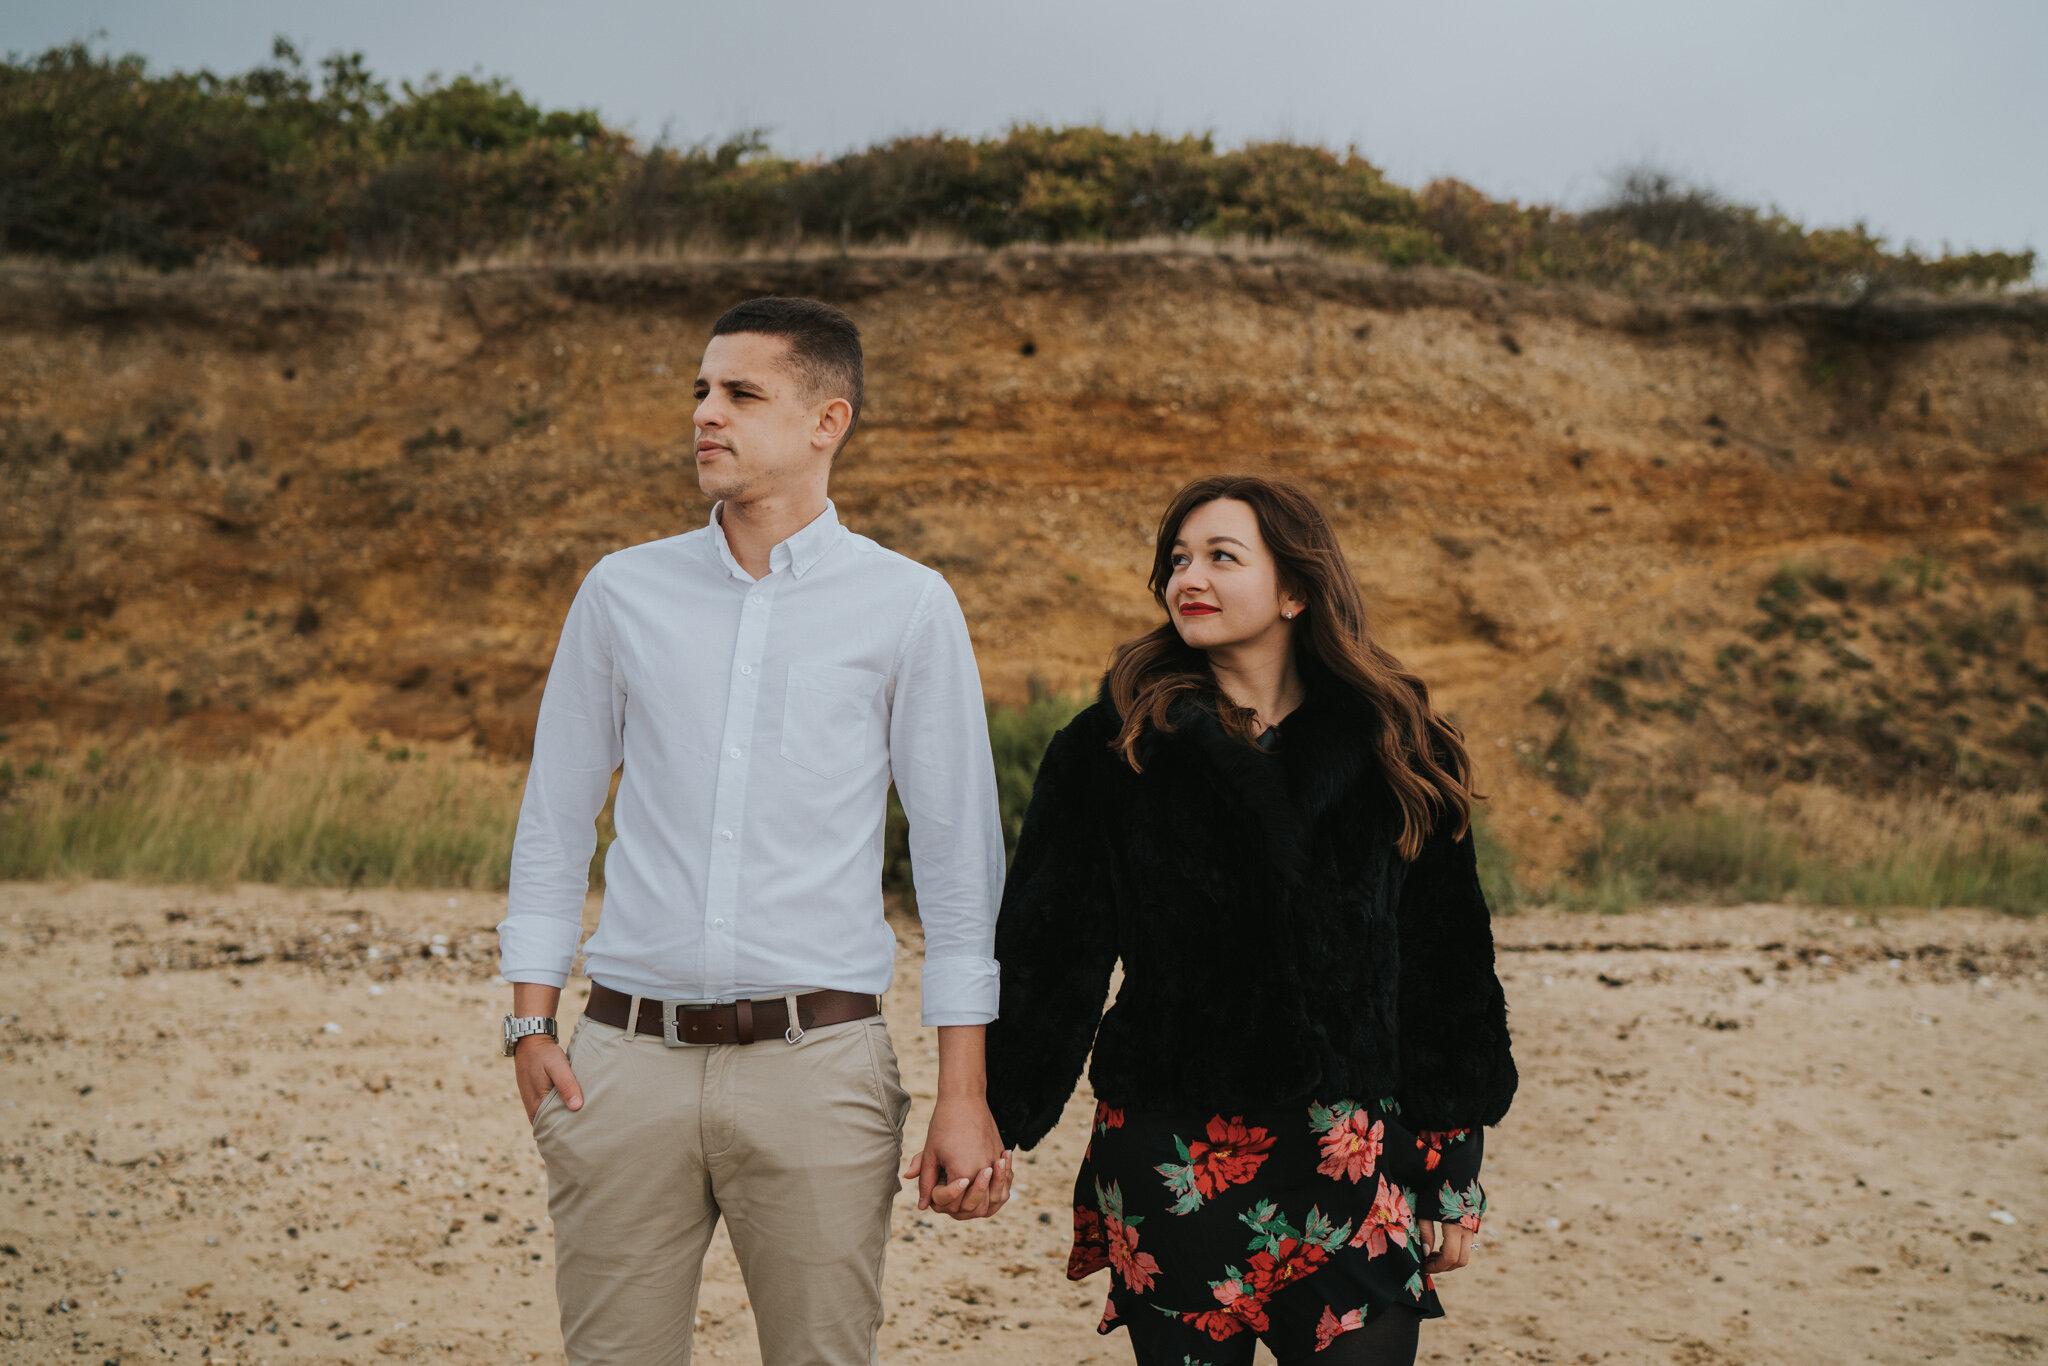 engagement-pre-wedding-hannah-michael-cudmore-grove-east-mersea-grace-elizabeth-colchester-essex-devon-suffolk-and-norfolk-alternative-wedding-and-family-photographer (21 of 51).jpg